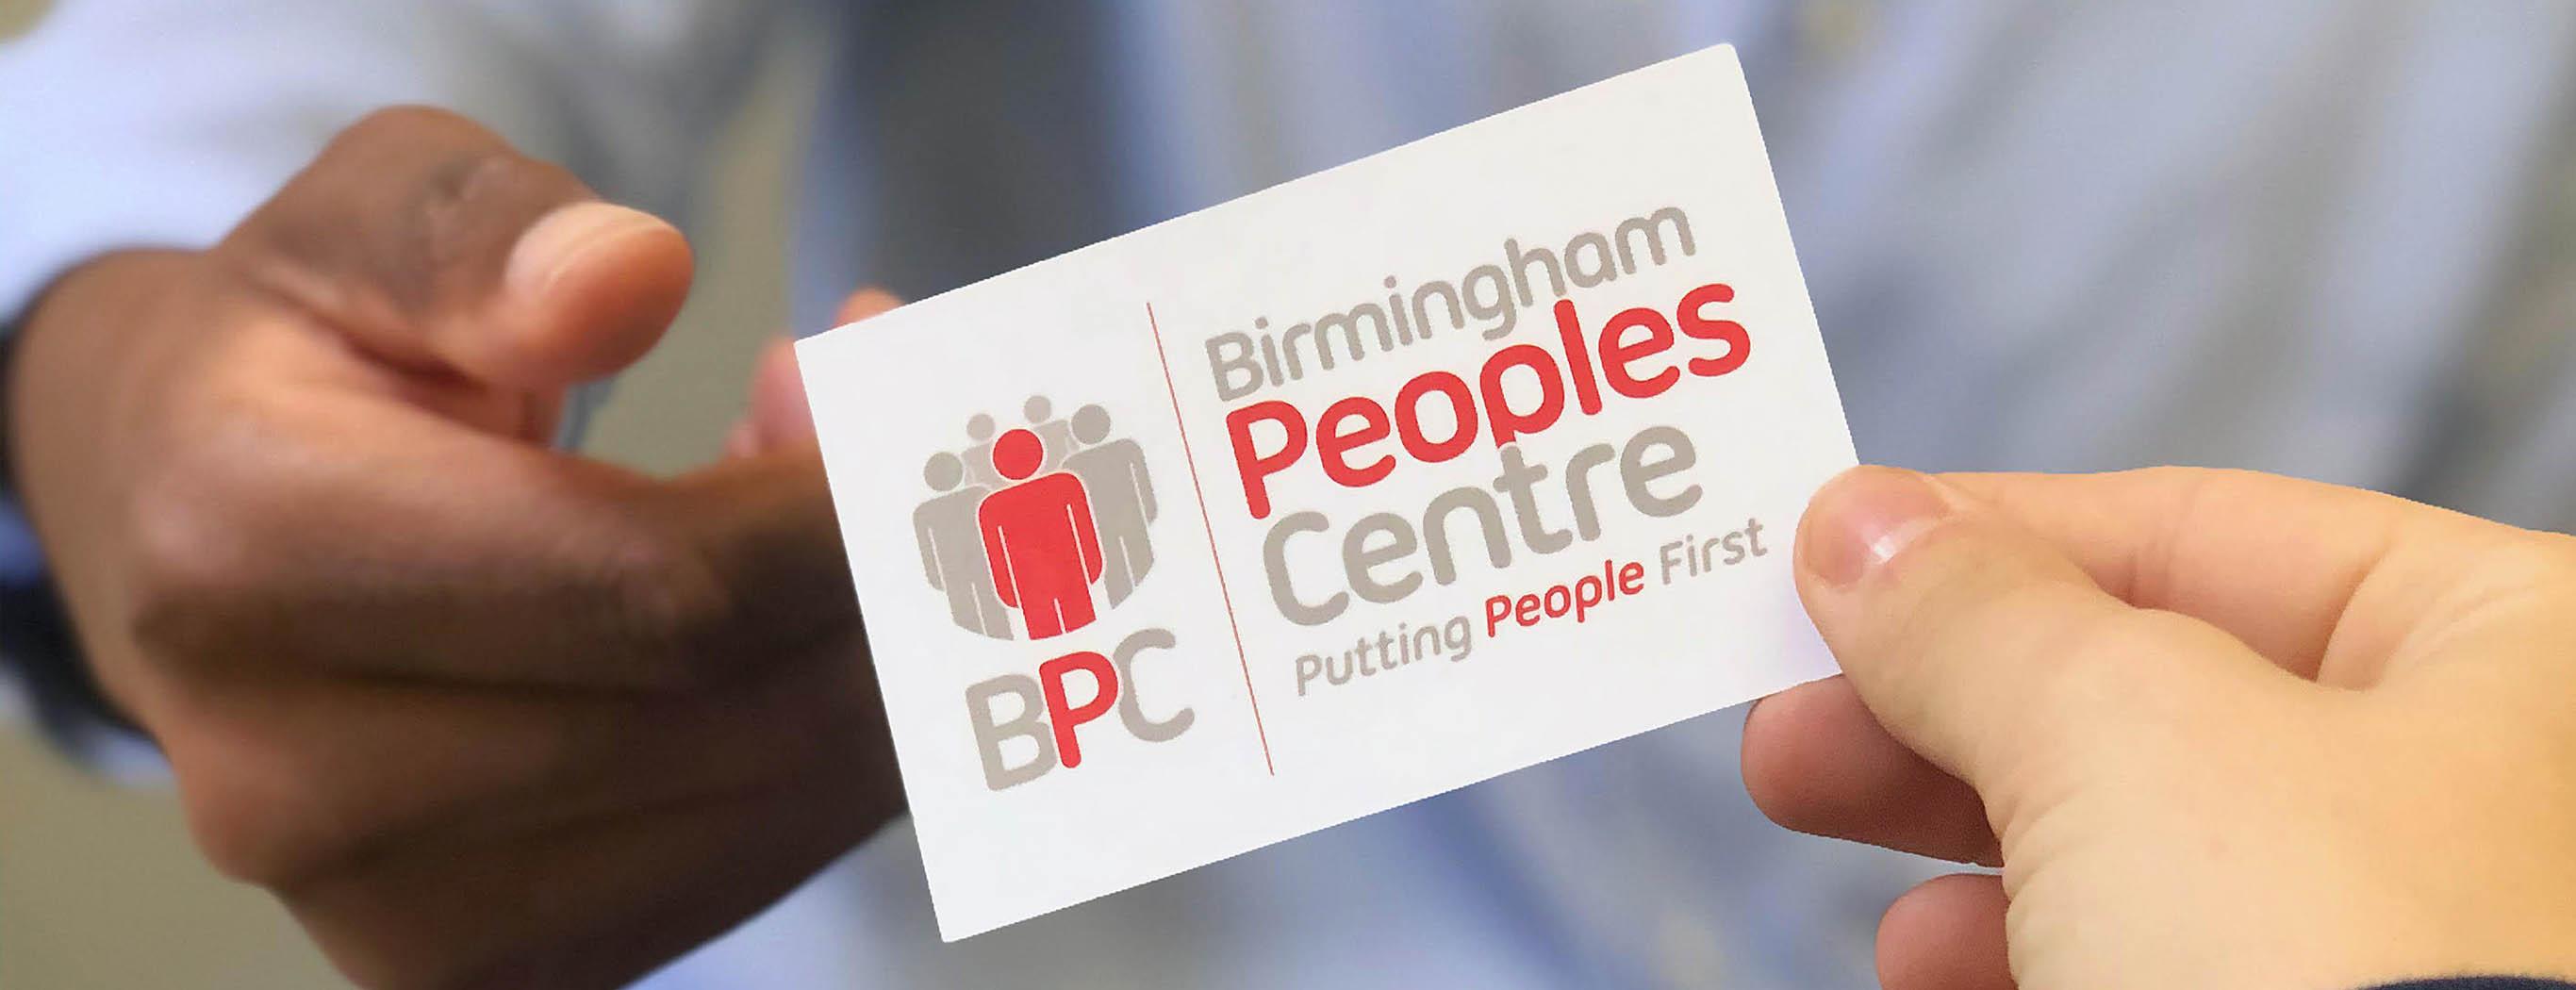 Birmingham Peoples Centre